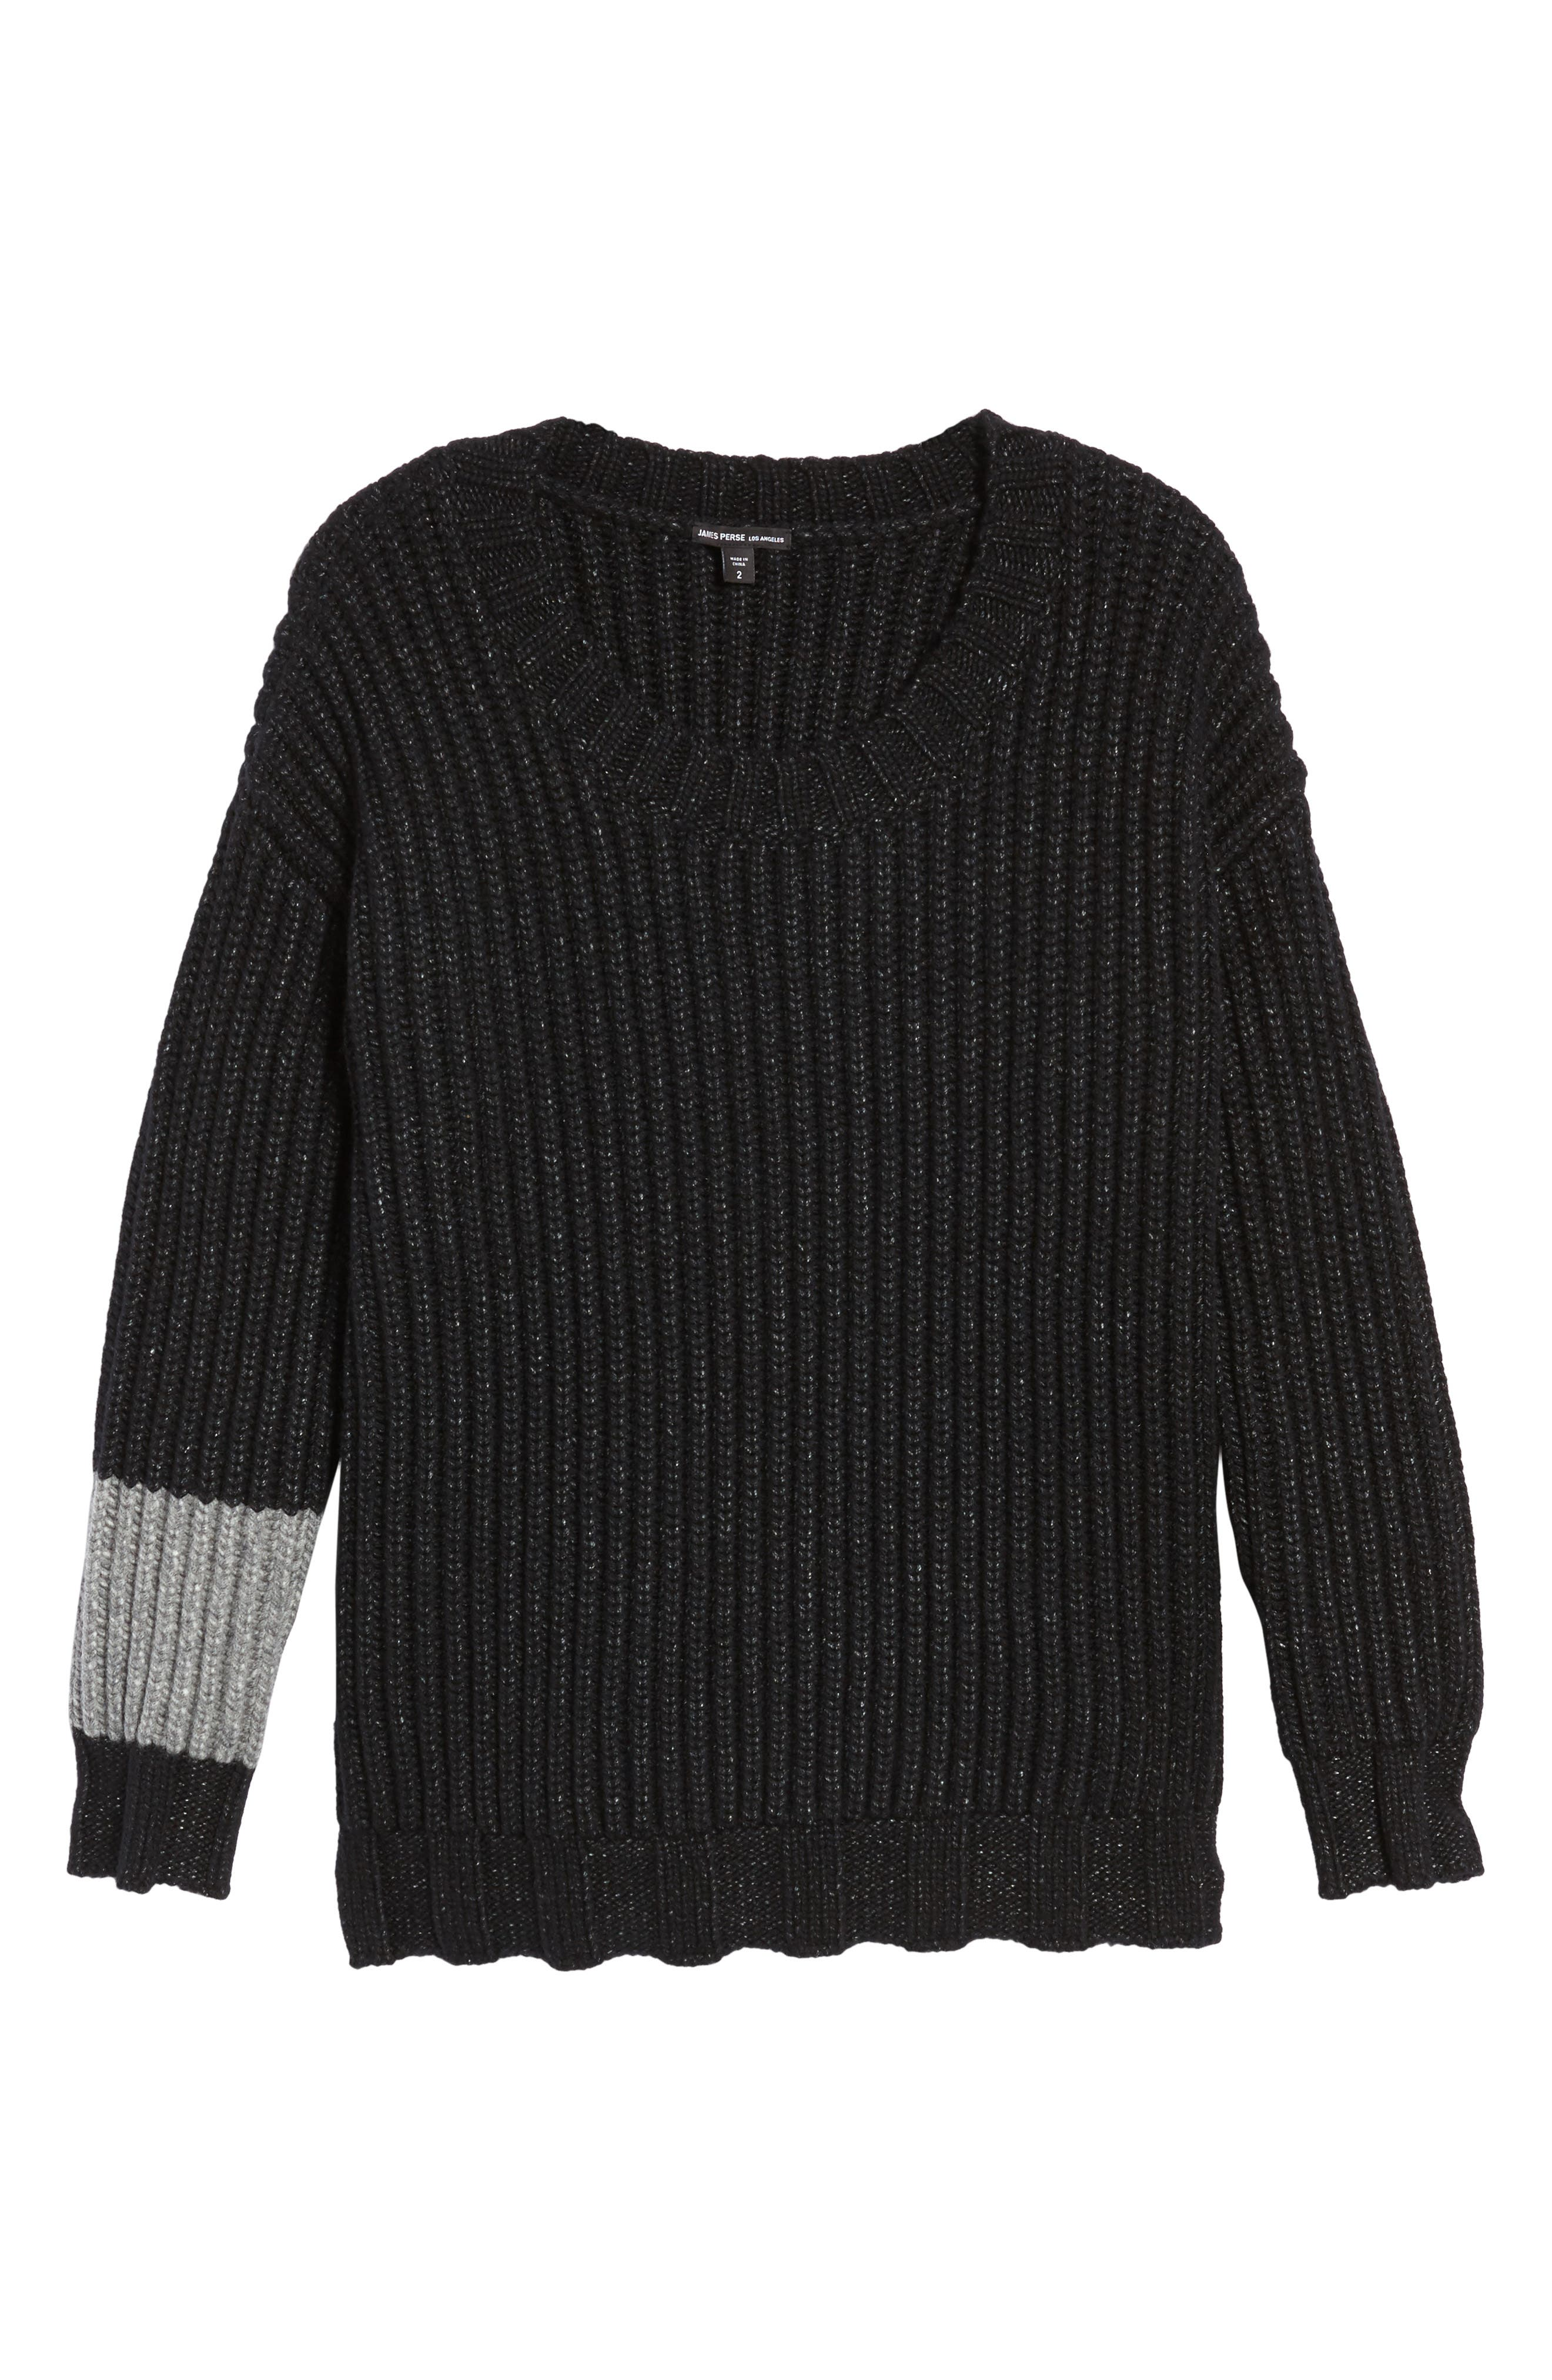 Chunky Armband Sweater,                             Alternate thumbnail 6, color,                             008